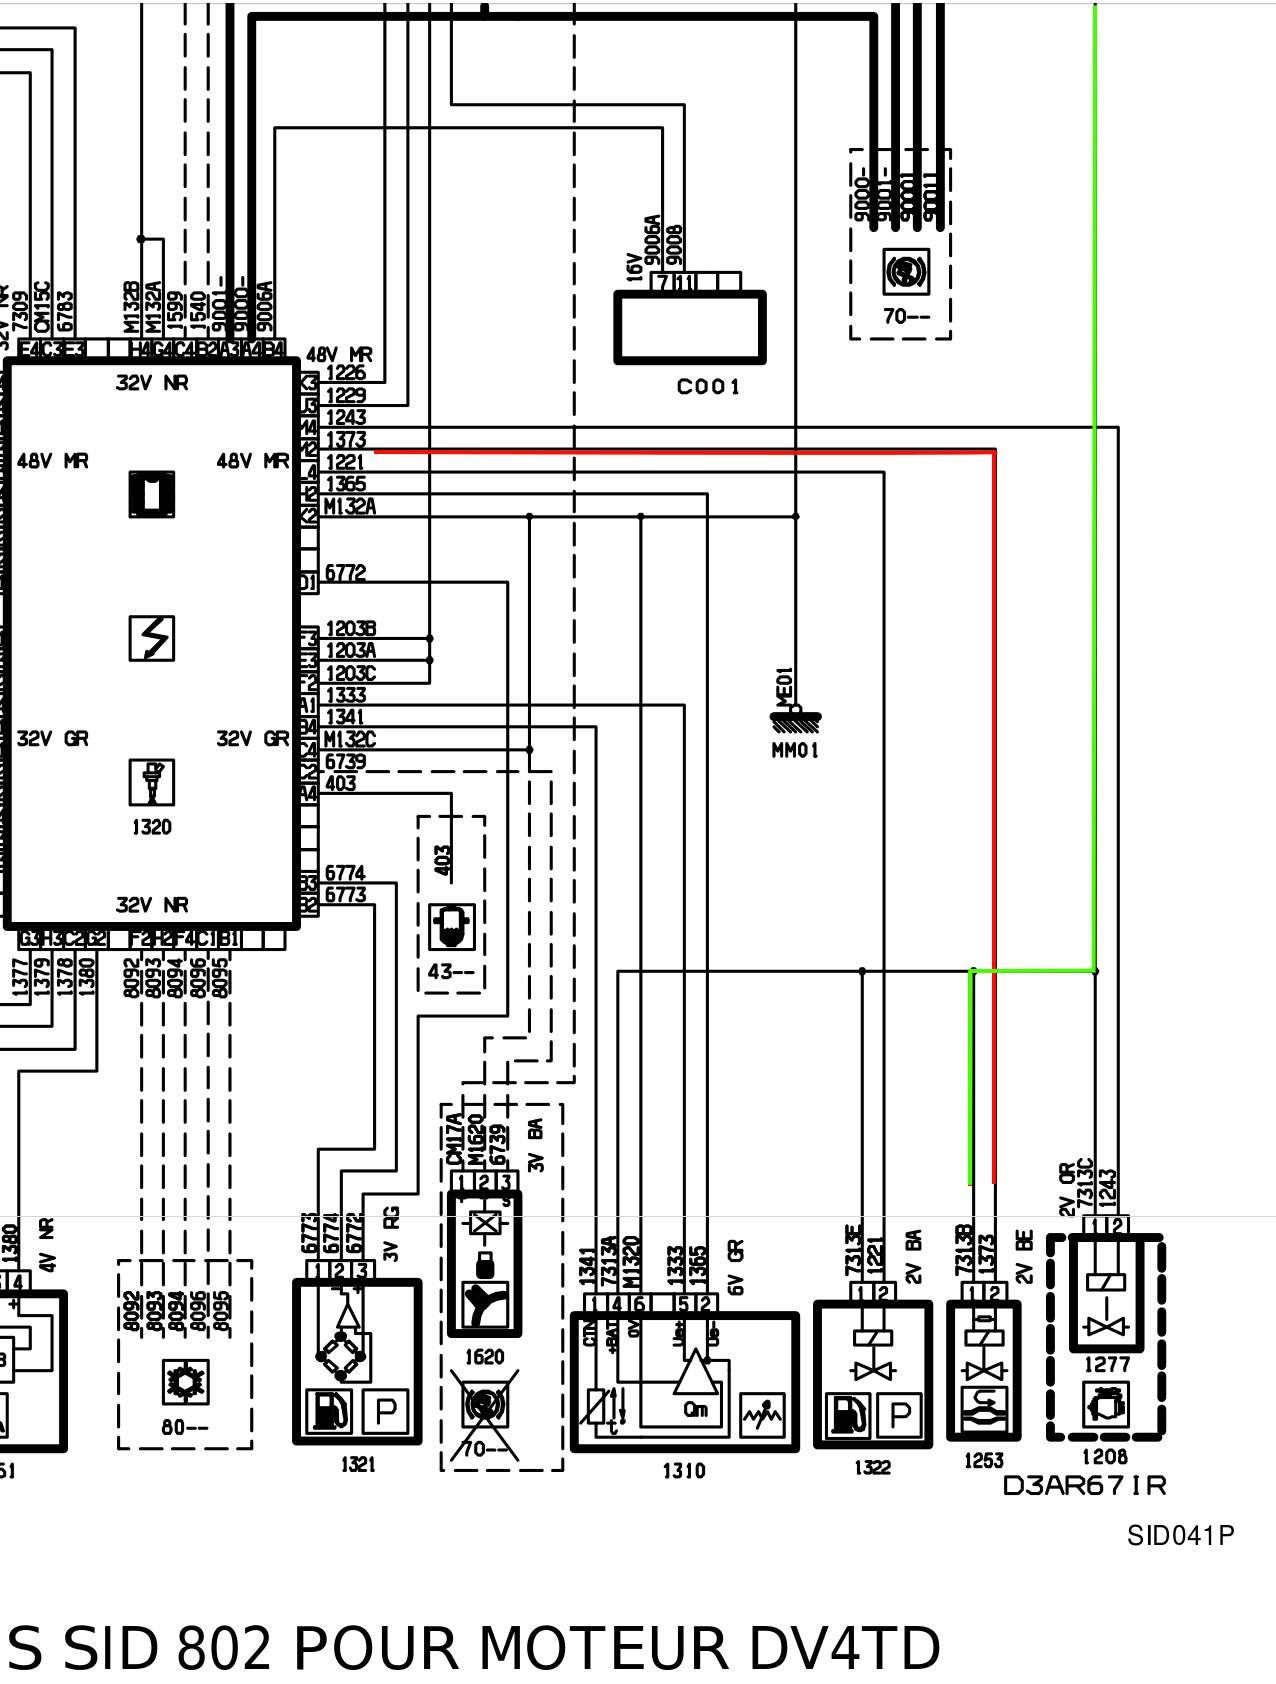 Citroen C3 Wiring Diagram - Wiring Diagram Server form-collect -  form-collect.ristoranteitredenari.it   Citroen C3 Wiring Diagram Pdf      Ristorante I Tre Denari Manerbio